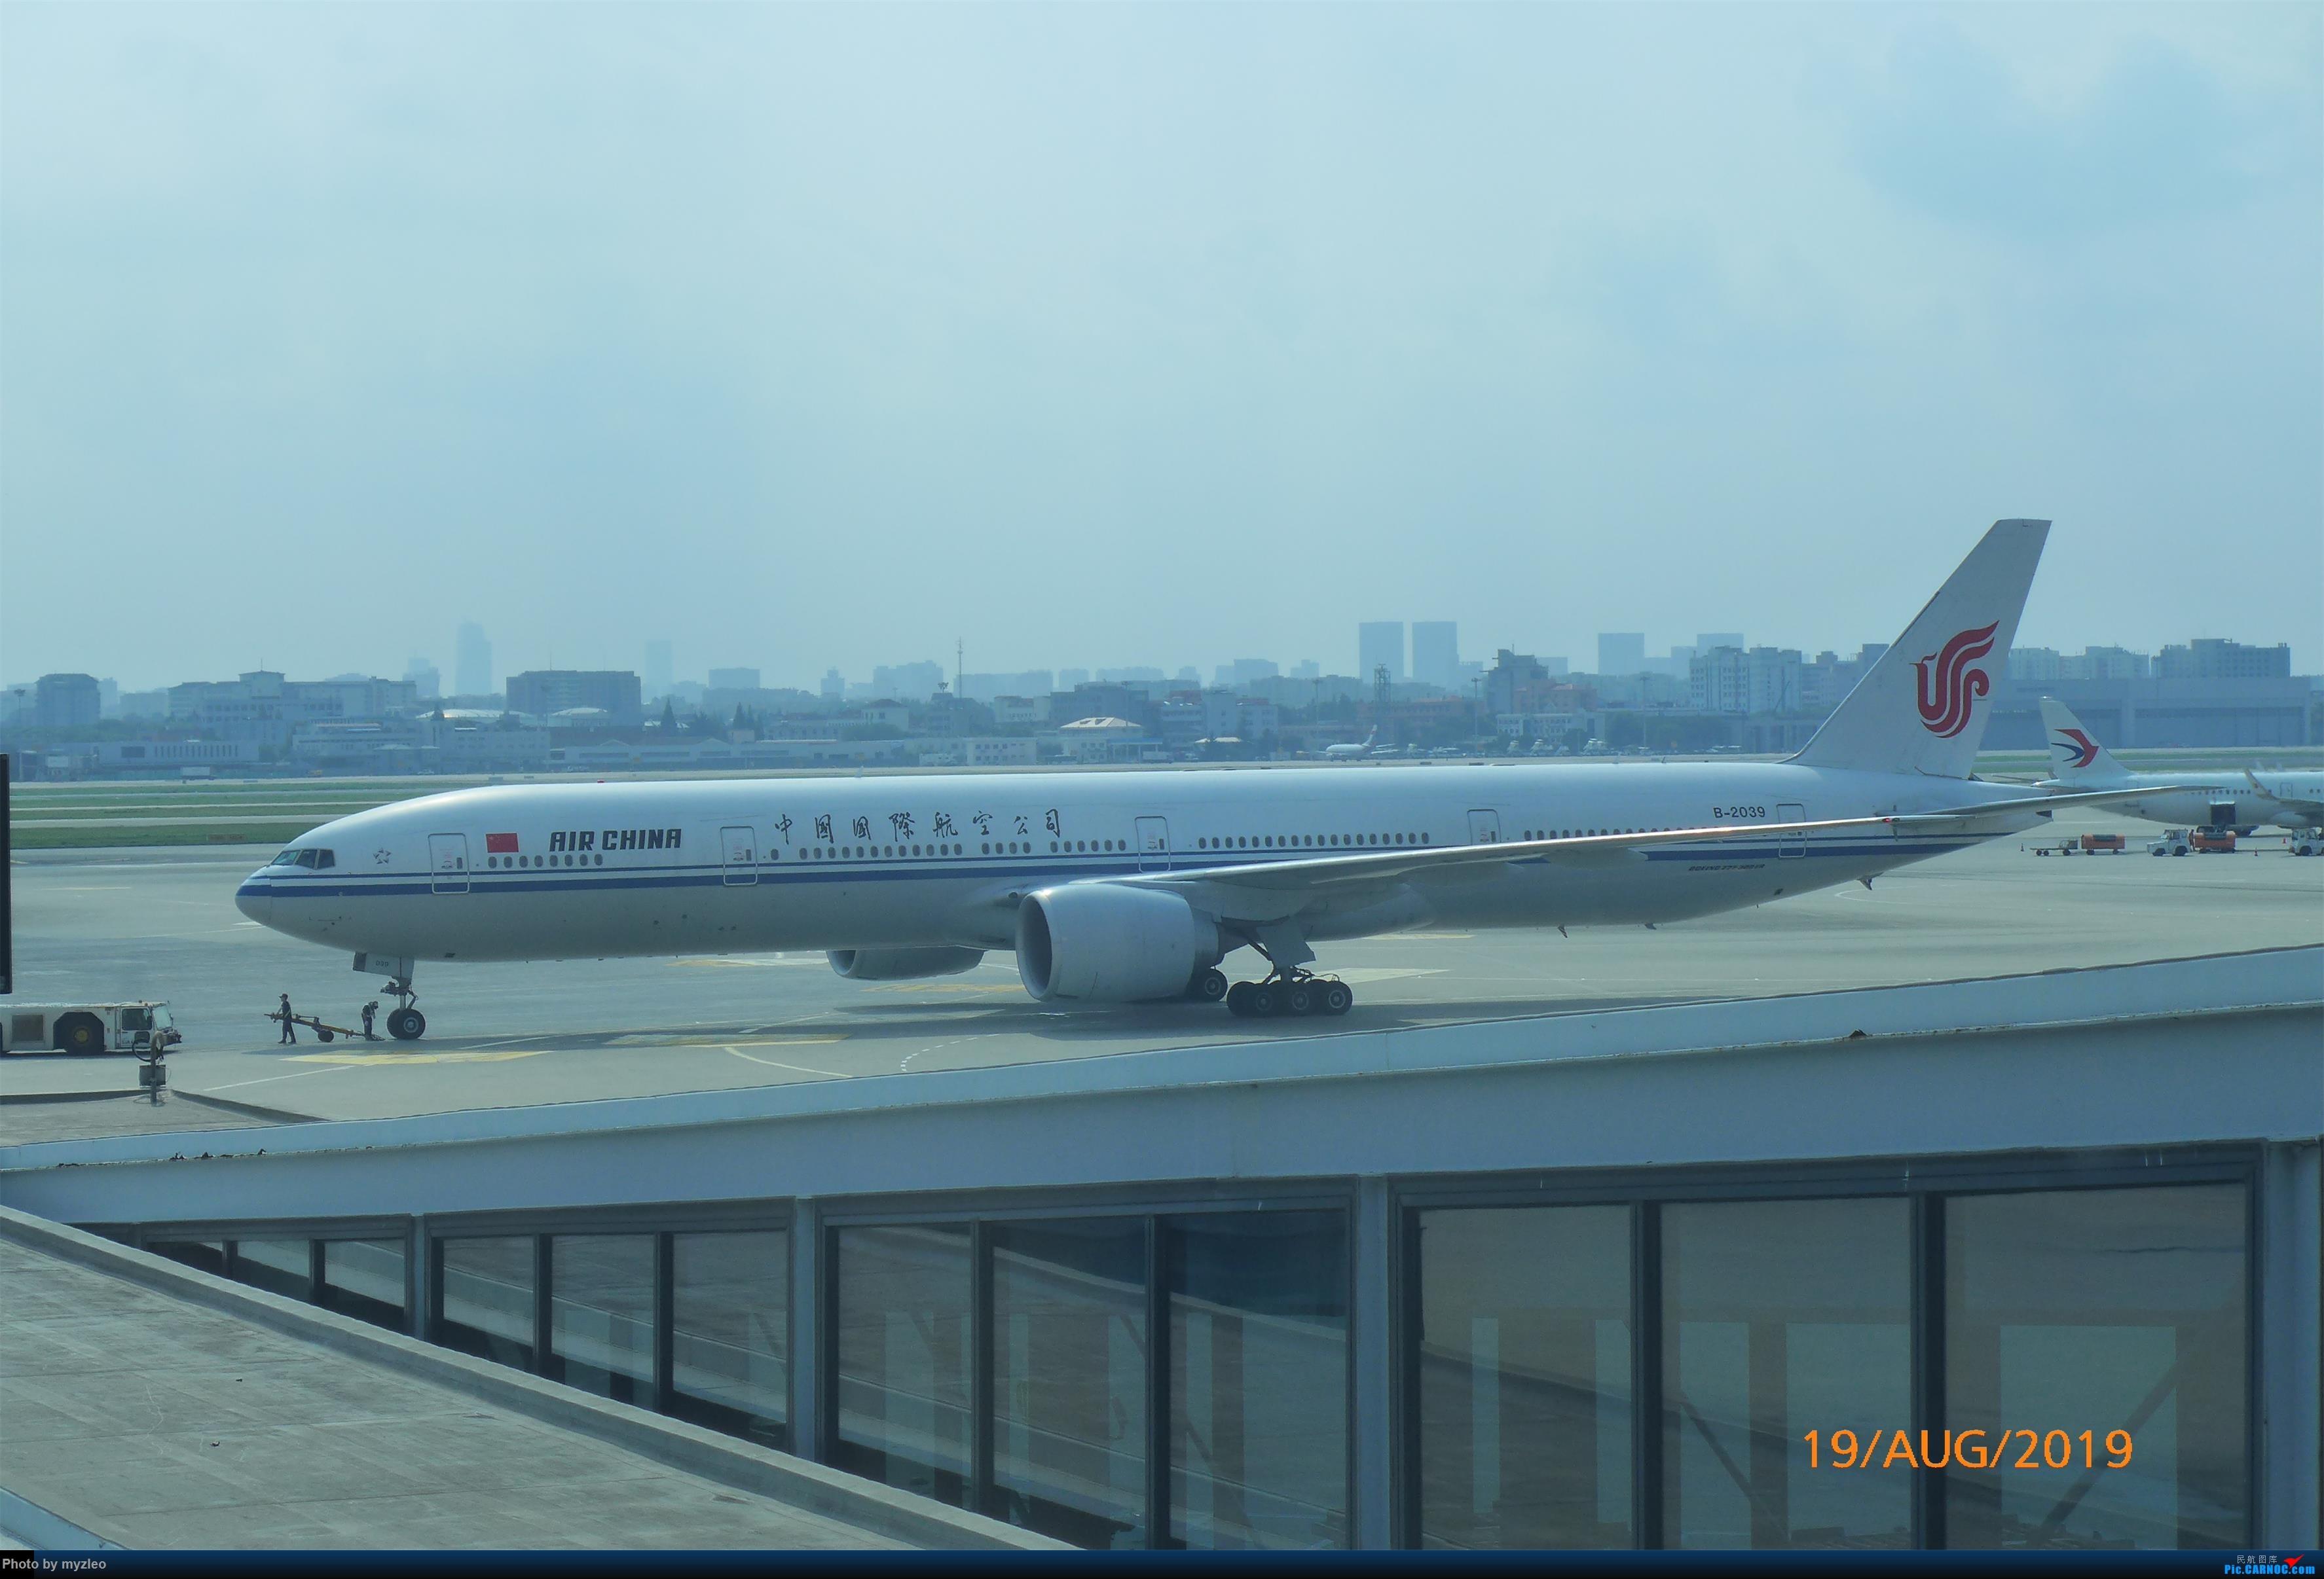 Re:[原创]【myzleo的游记5.1】梦圆一九(1)首搭国航359,北京城里到处走 BOEING 777-300ER B-2039 中国上海虹桥国际机场